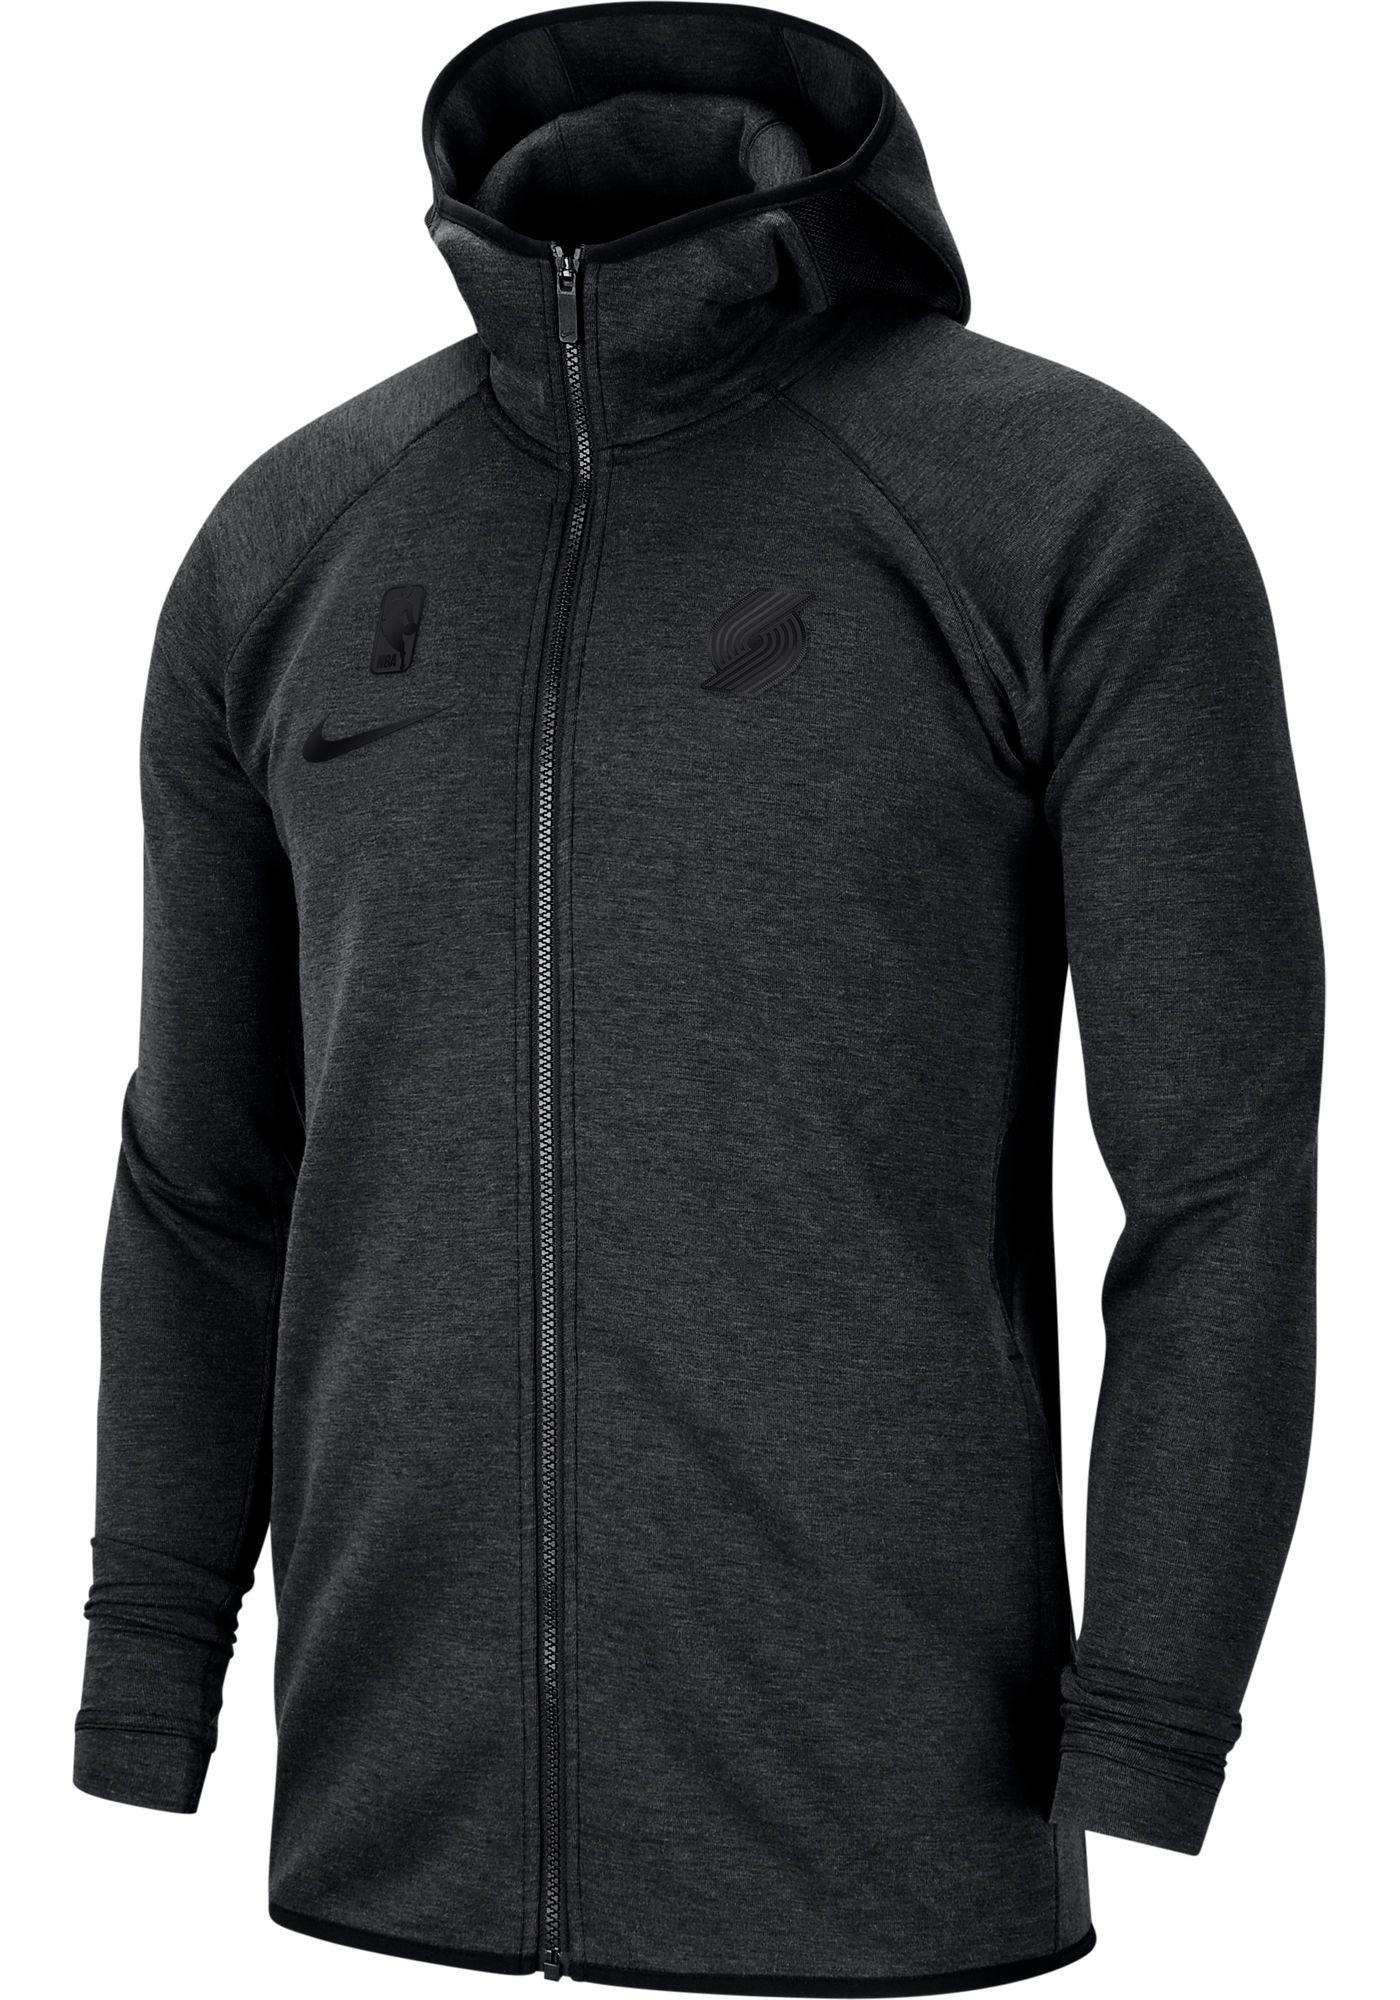 Nike Men's Portland Trail Blazers On-Court Dri-FIT Showtime Full-Zip Hoodie